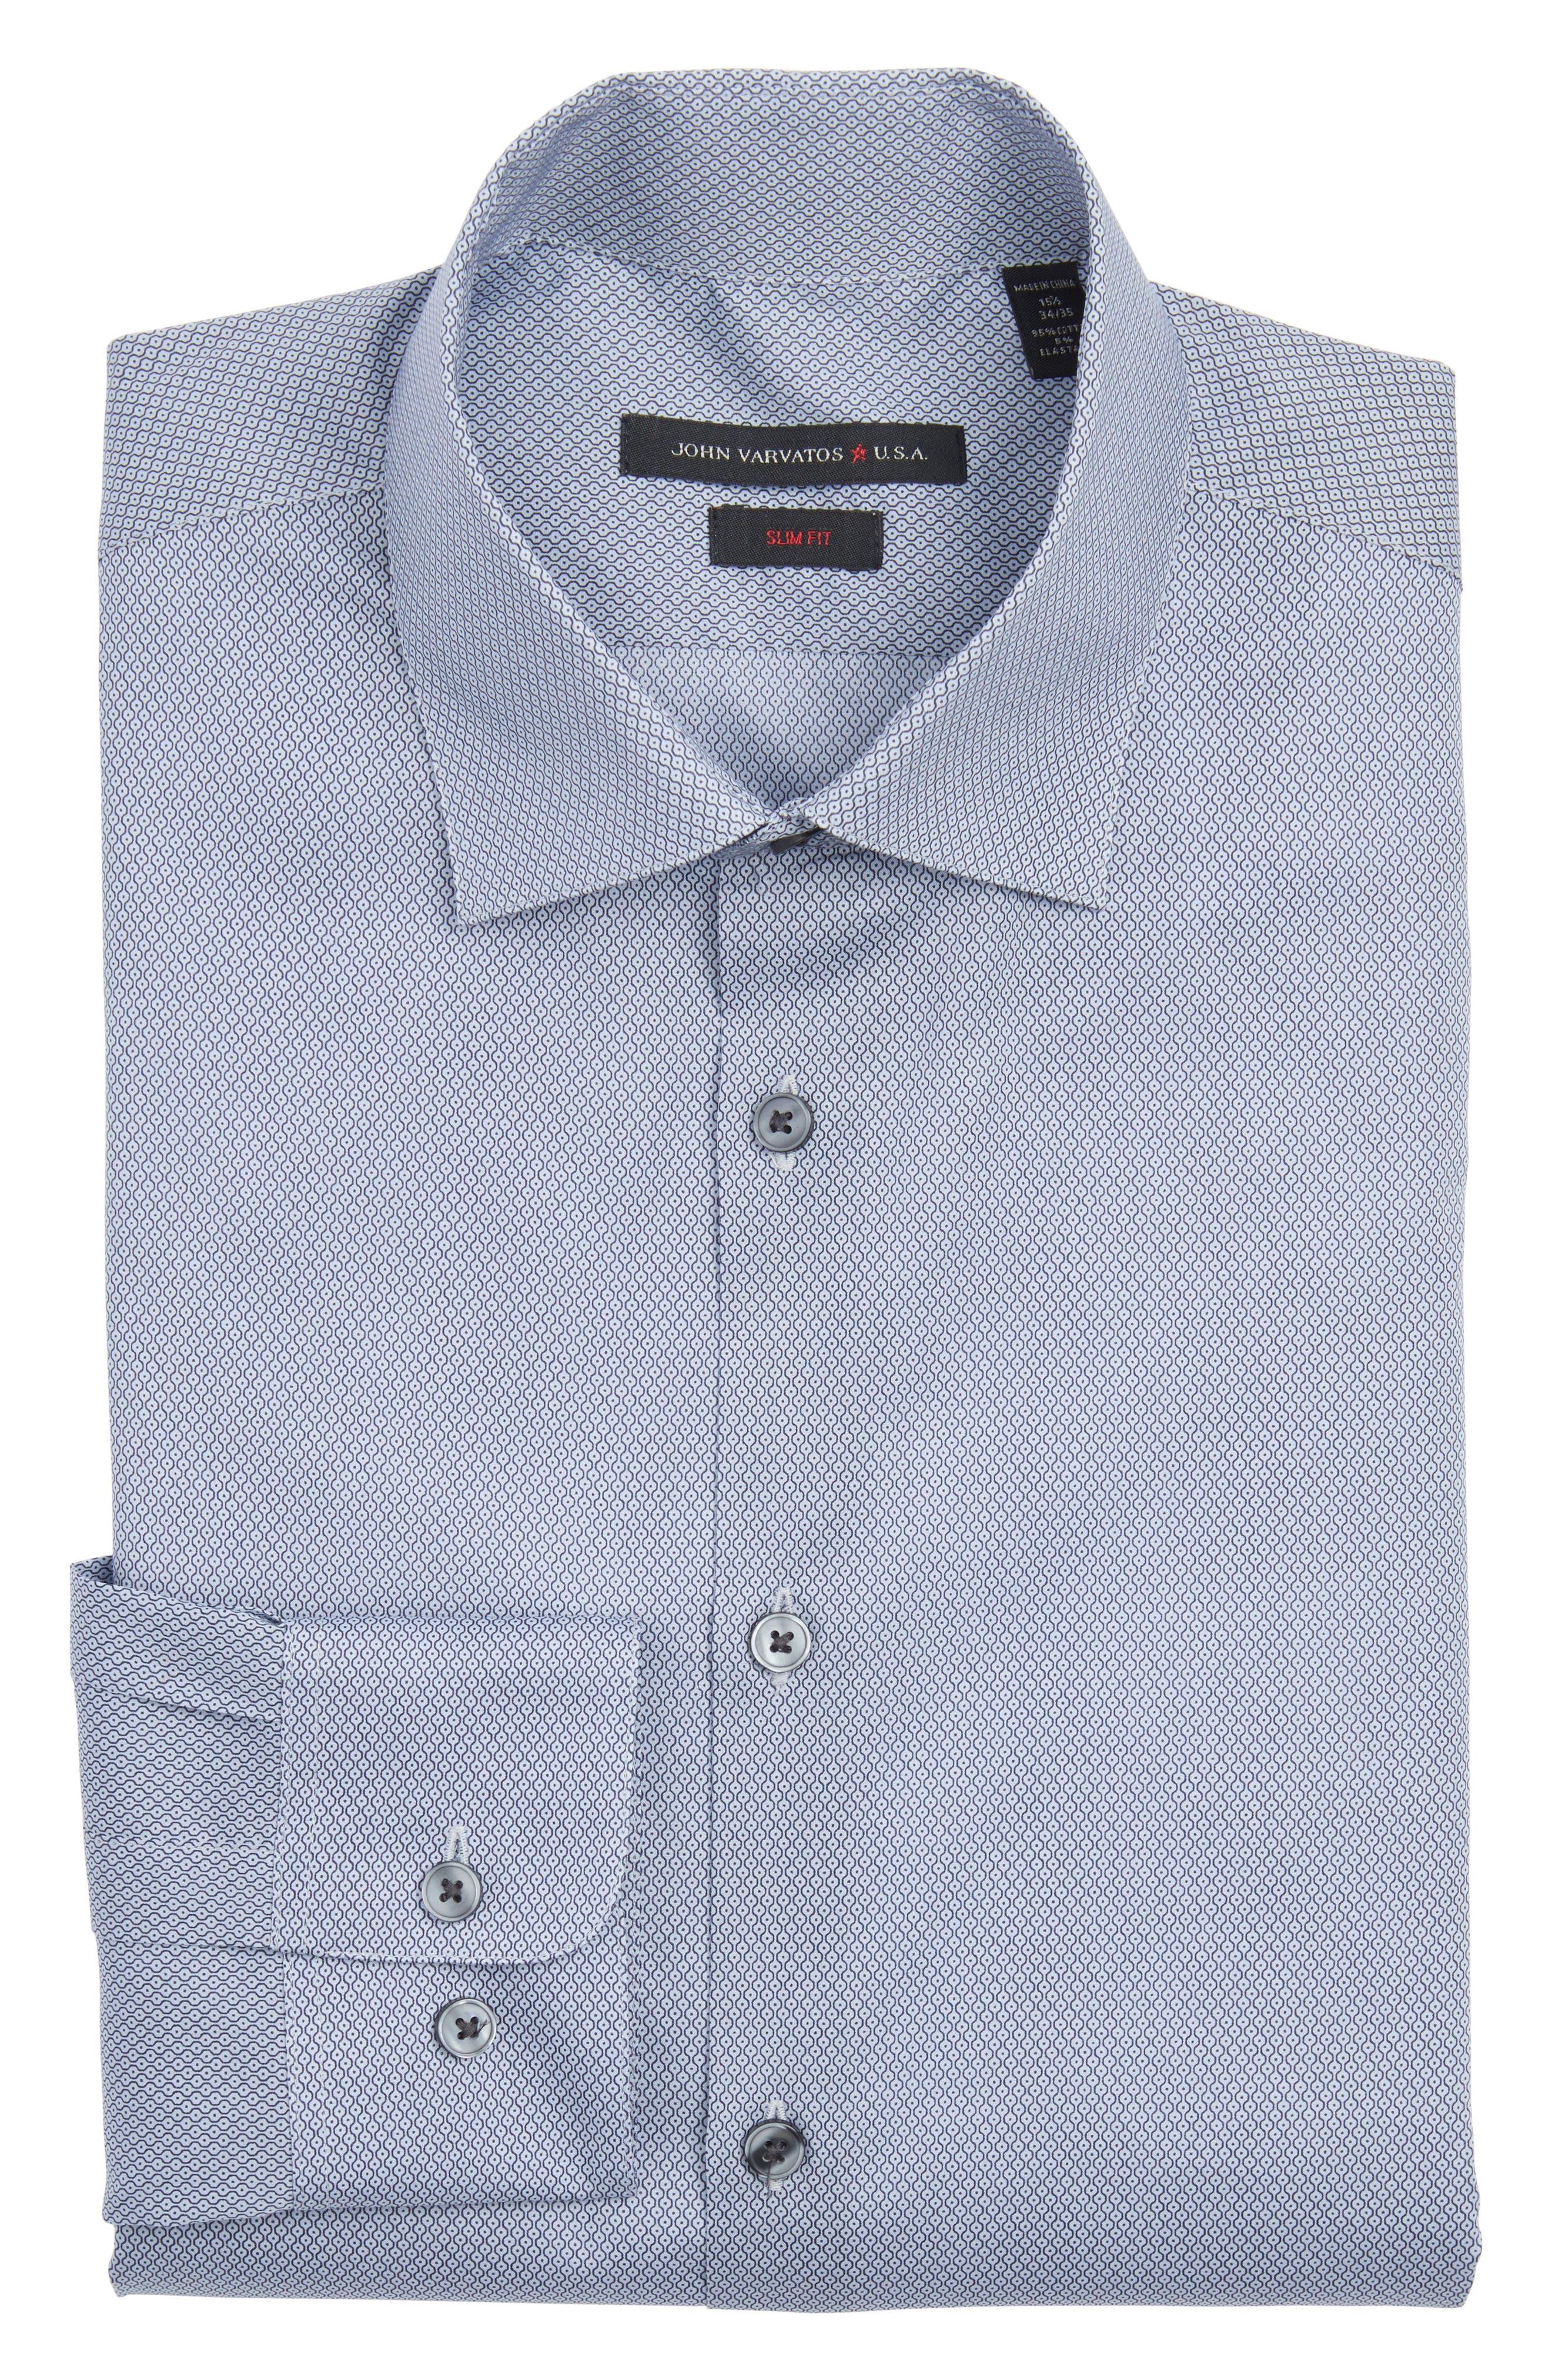 Main Image - John Varvatos Star USA Slim Fit Geometric Dress Shirt